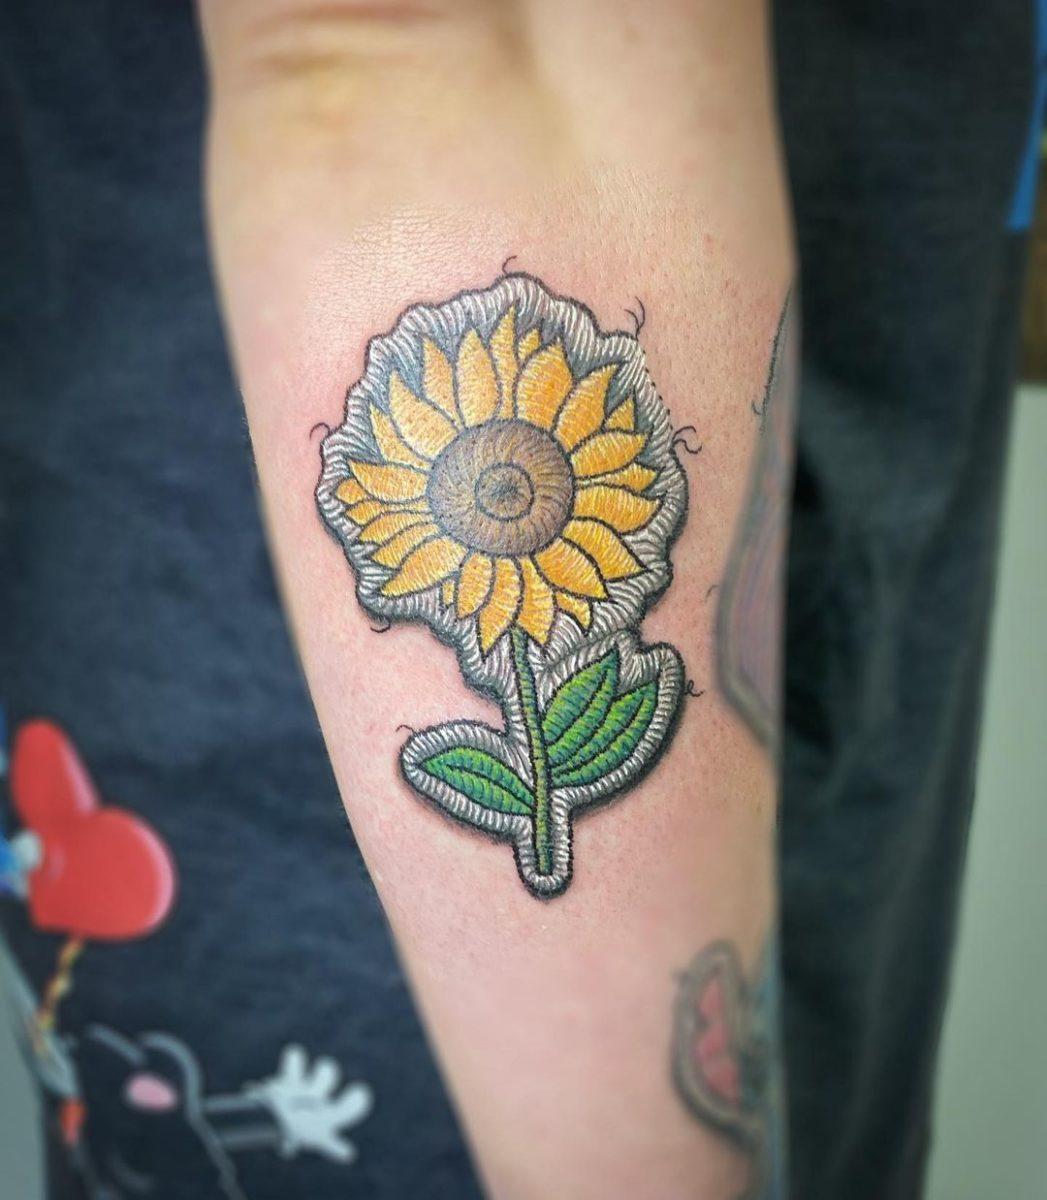 25 patch tattoo ideas